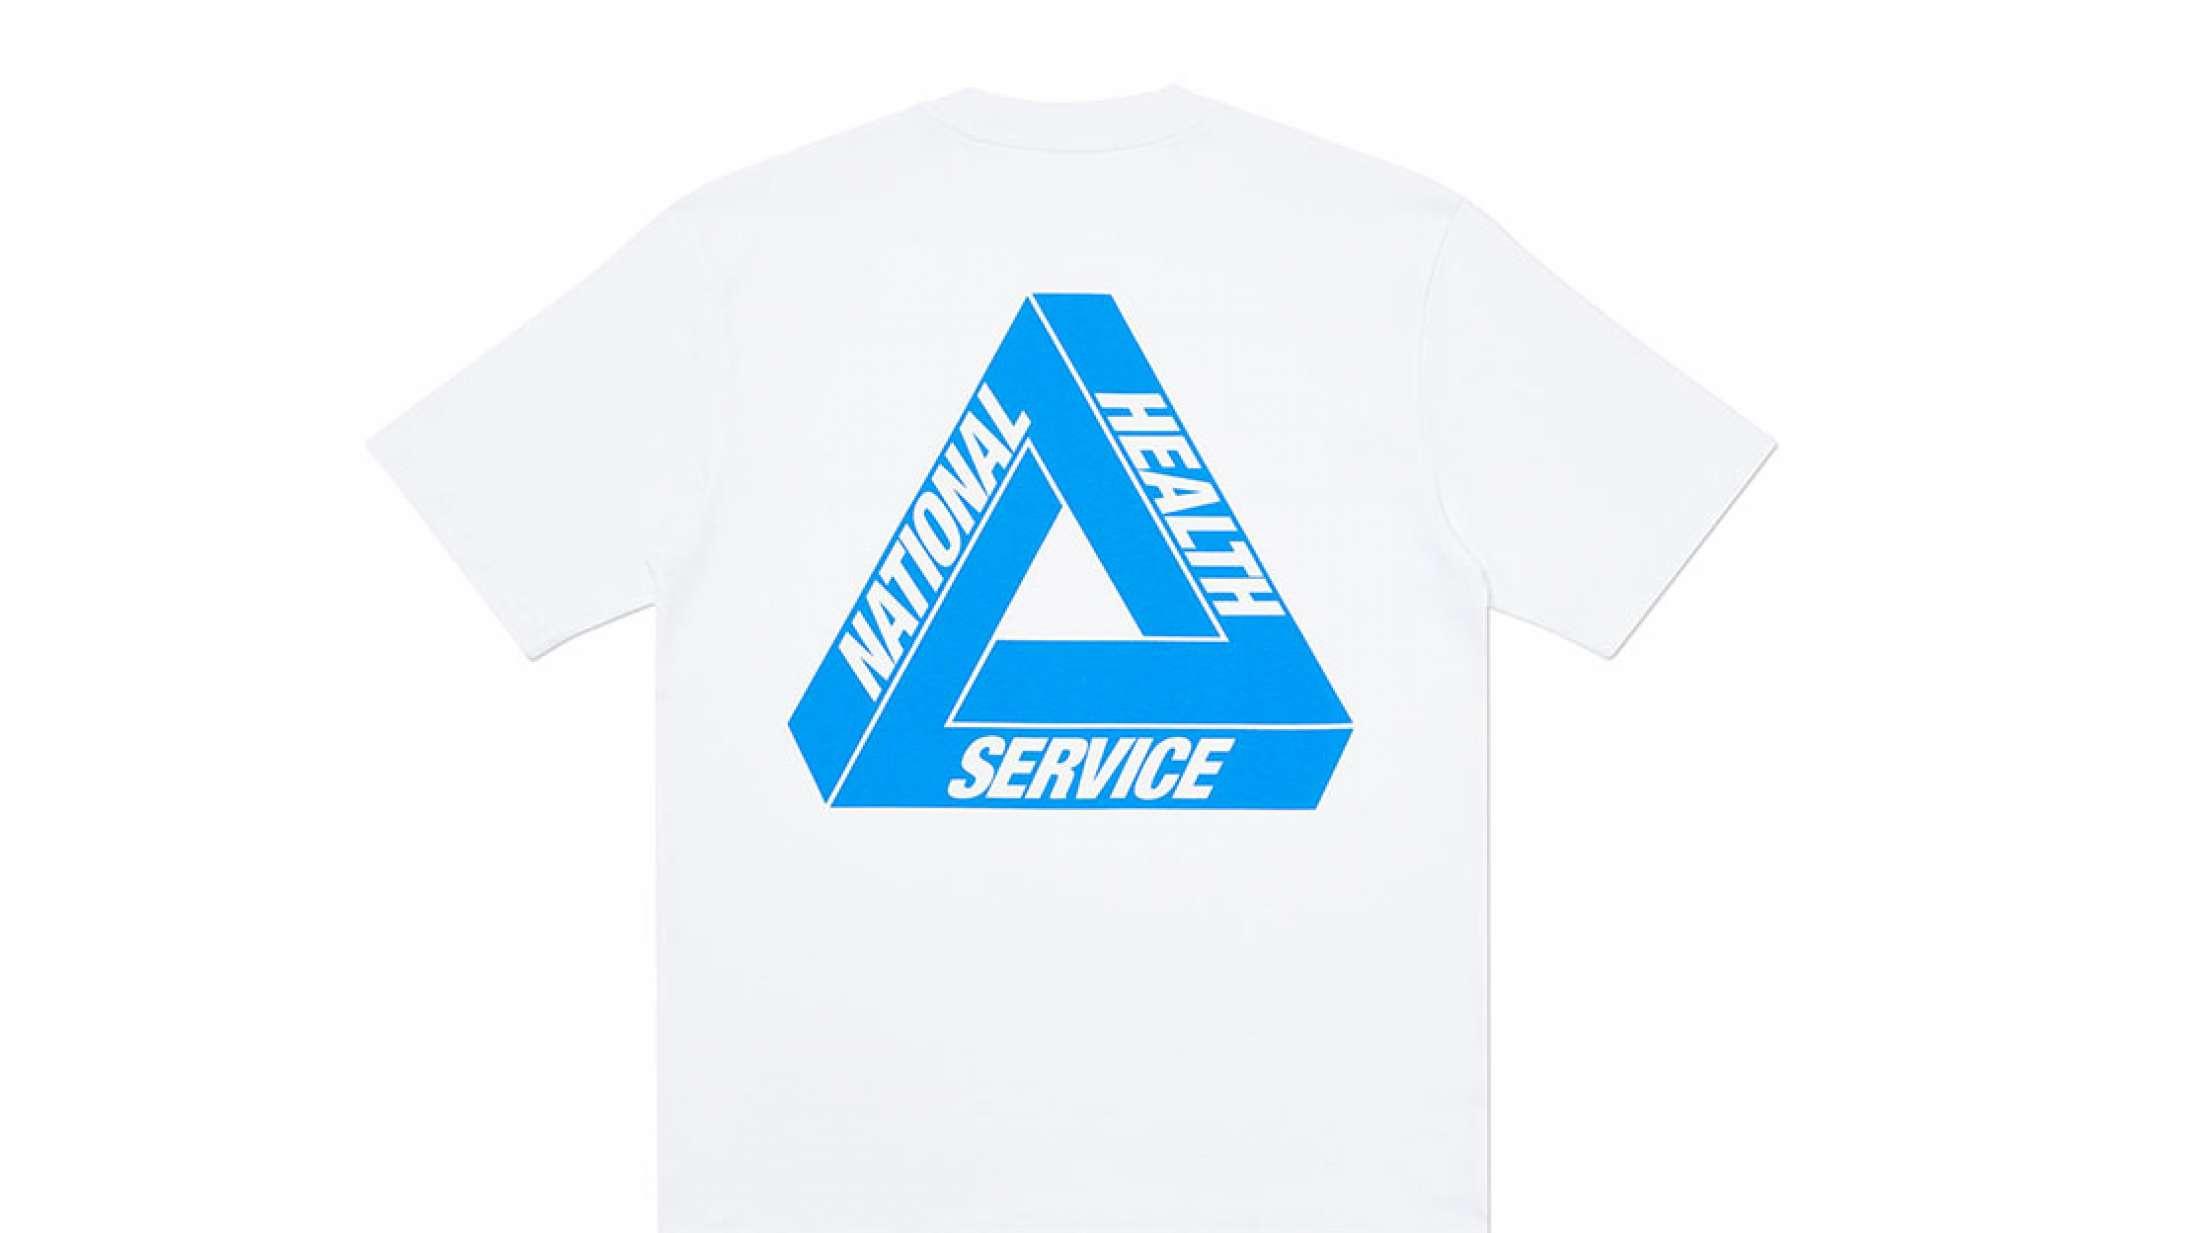 Er tiden løbet fra velgørenheds-t-shirten?